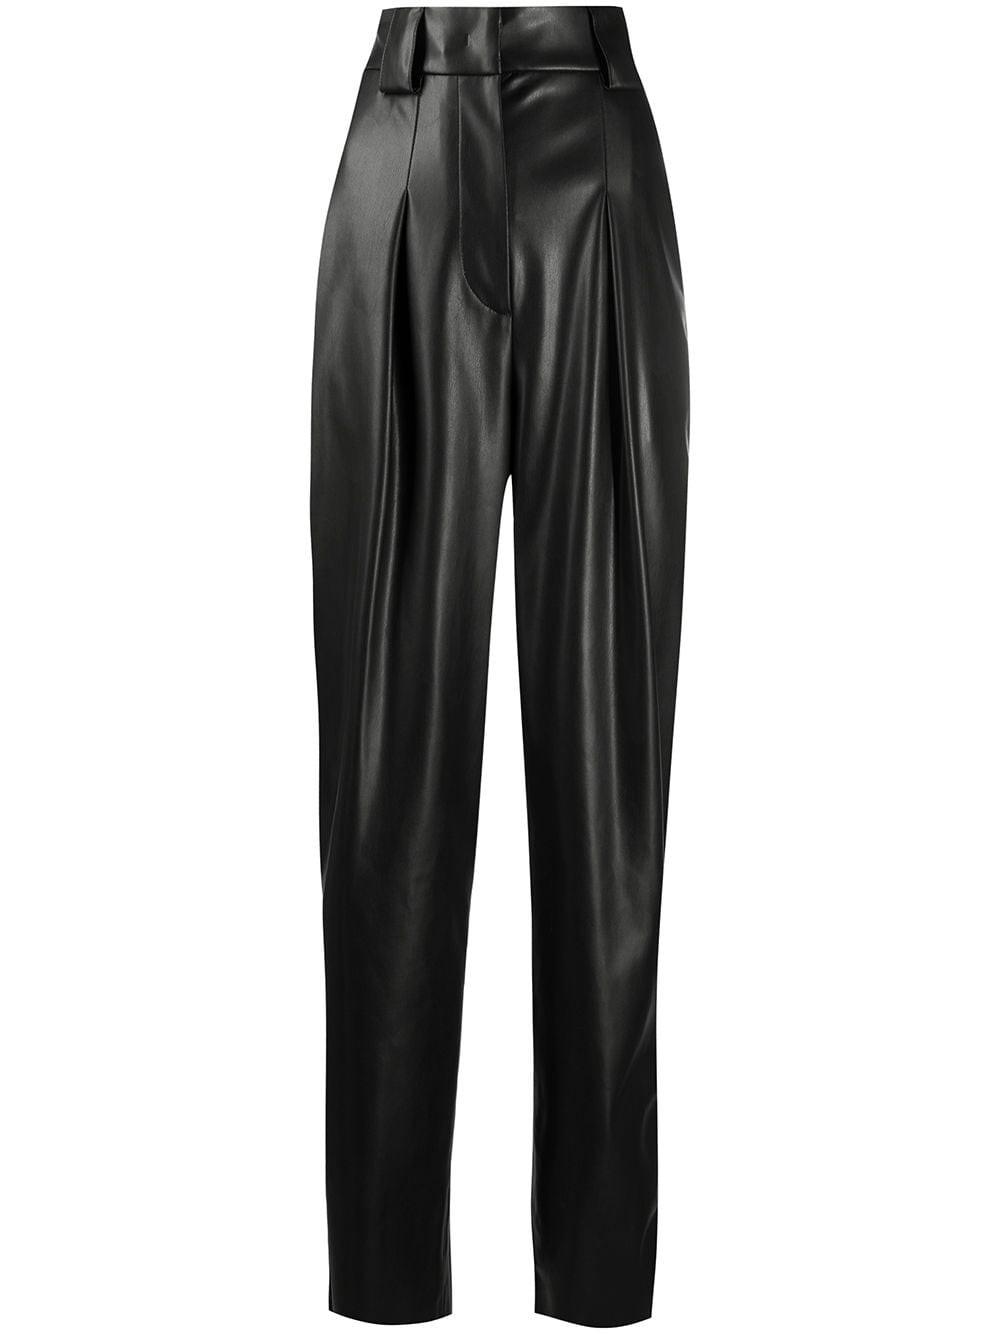 BROGNANO Faux Leather Straight-Leg Trousers